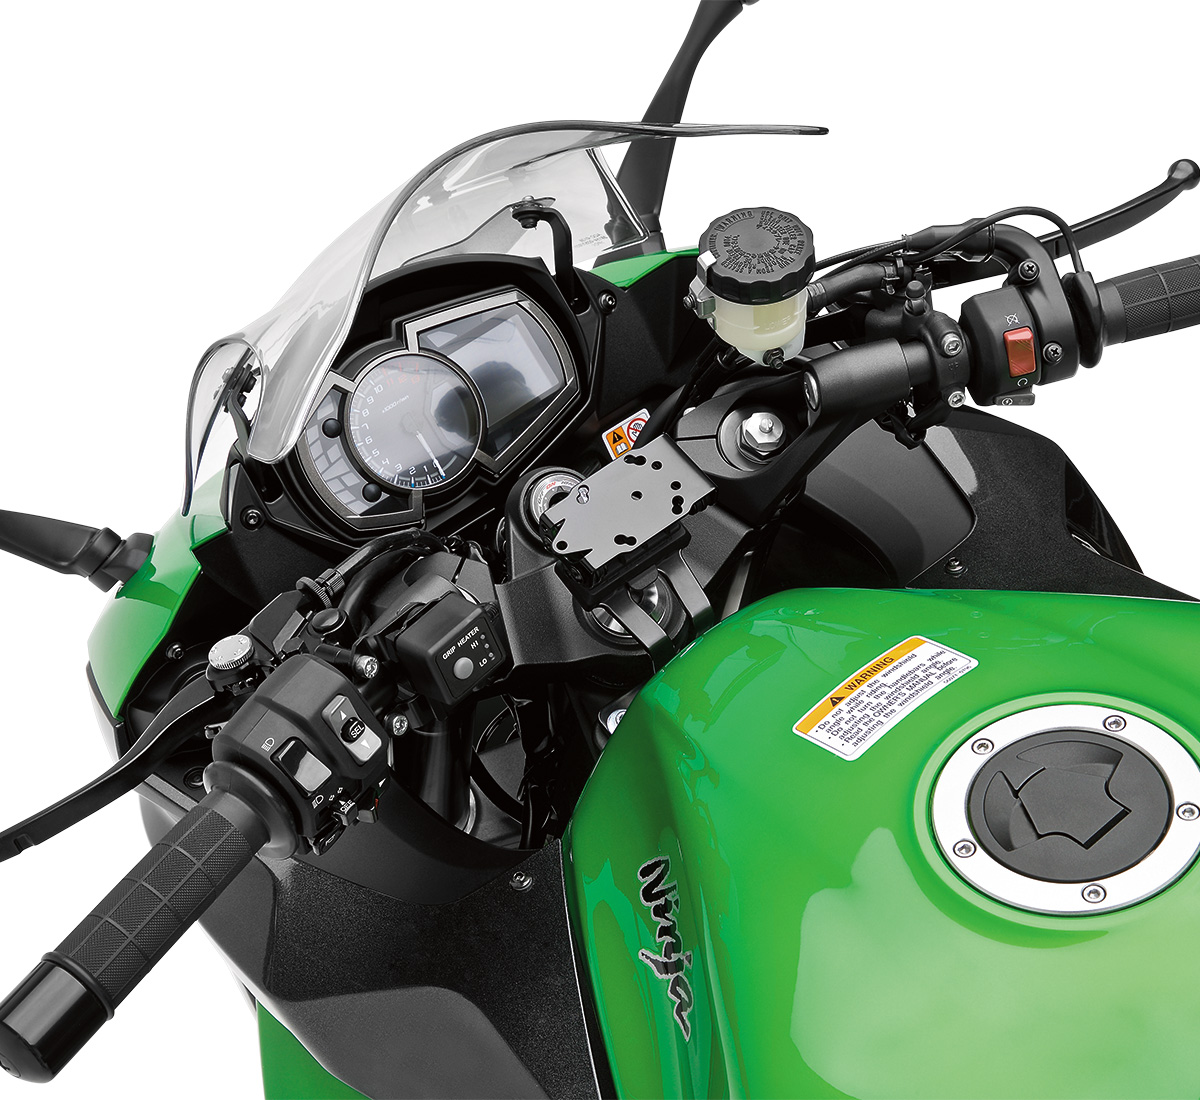 Motorcycle Dc Power Outlet Kawasaki Ninja 650r Wiring Harness Gps Mount